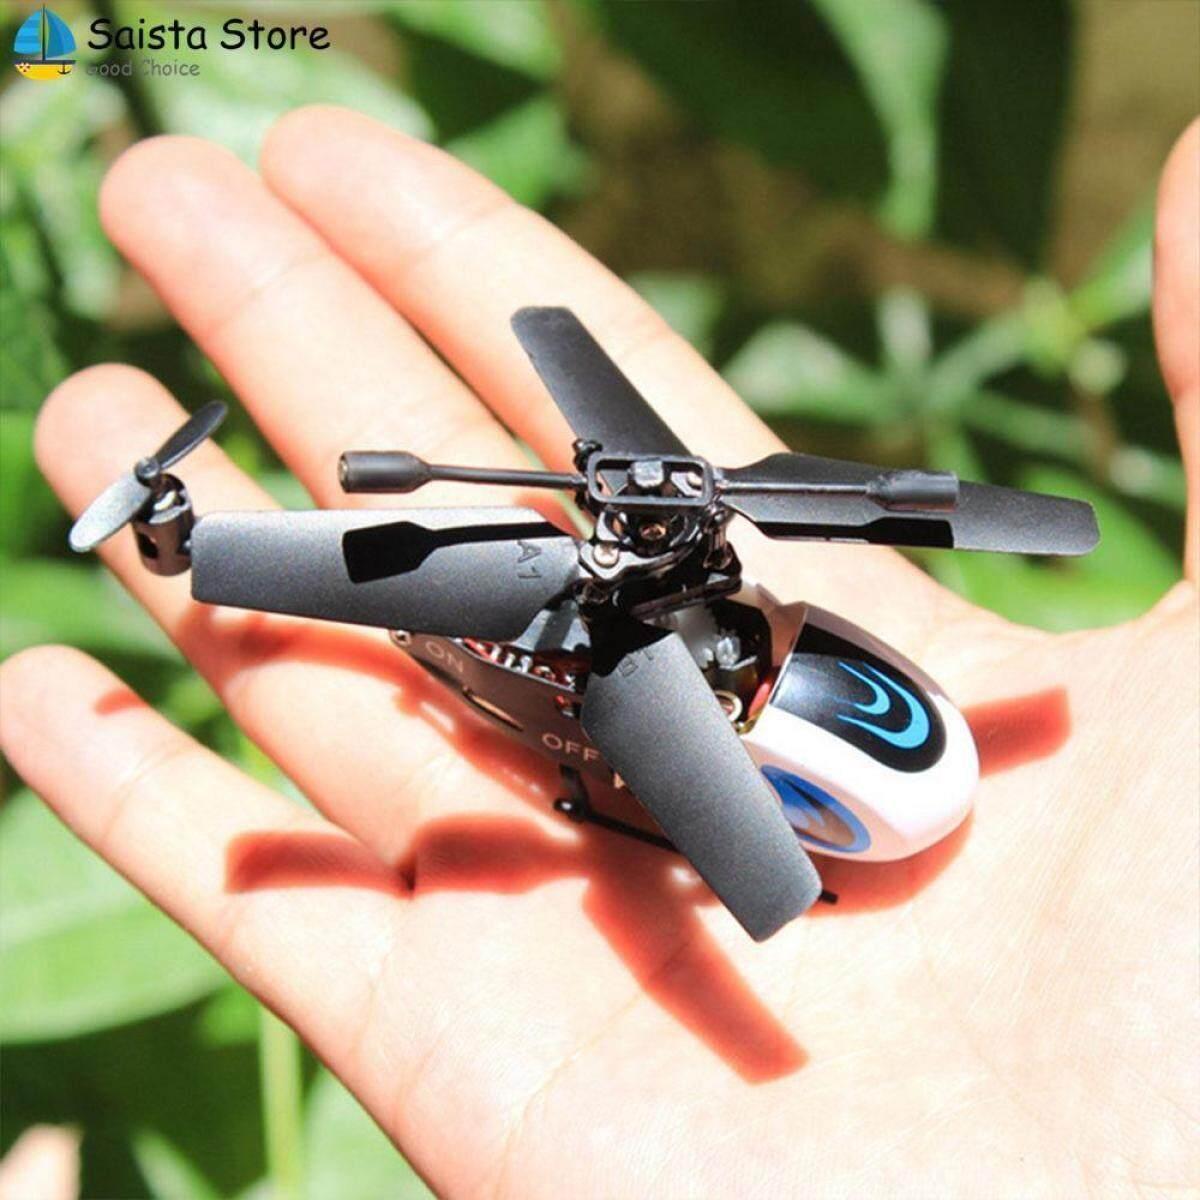 Saista Drone ของเล่นโมเดลเฮลิคอปเตอร์ควบคุมรีโมตพลาสติก Dc 5 V 2 ช่องกระพริบ By Uugrojuaw.